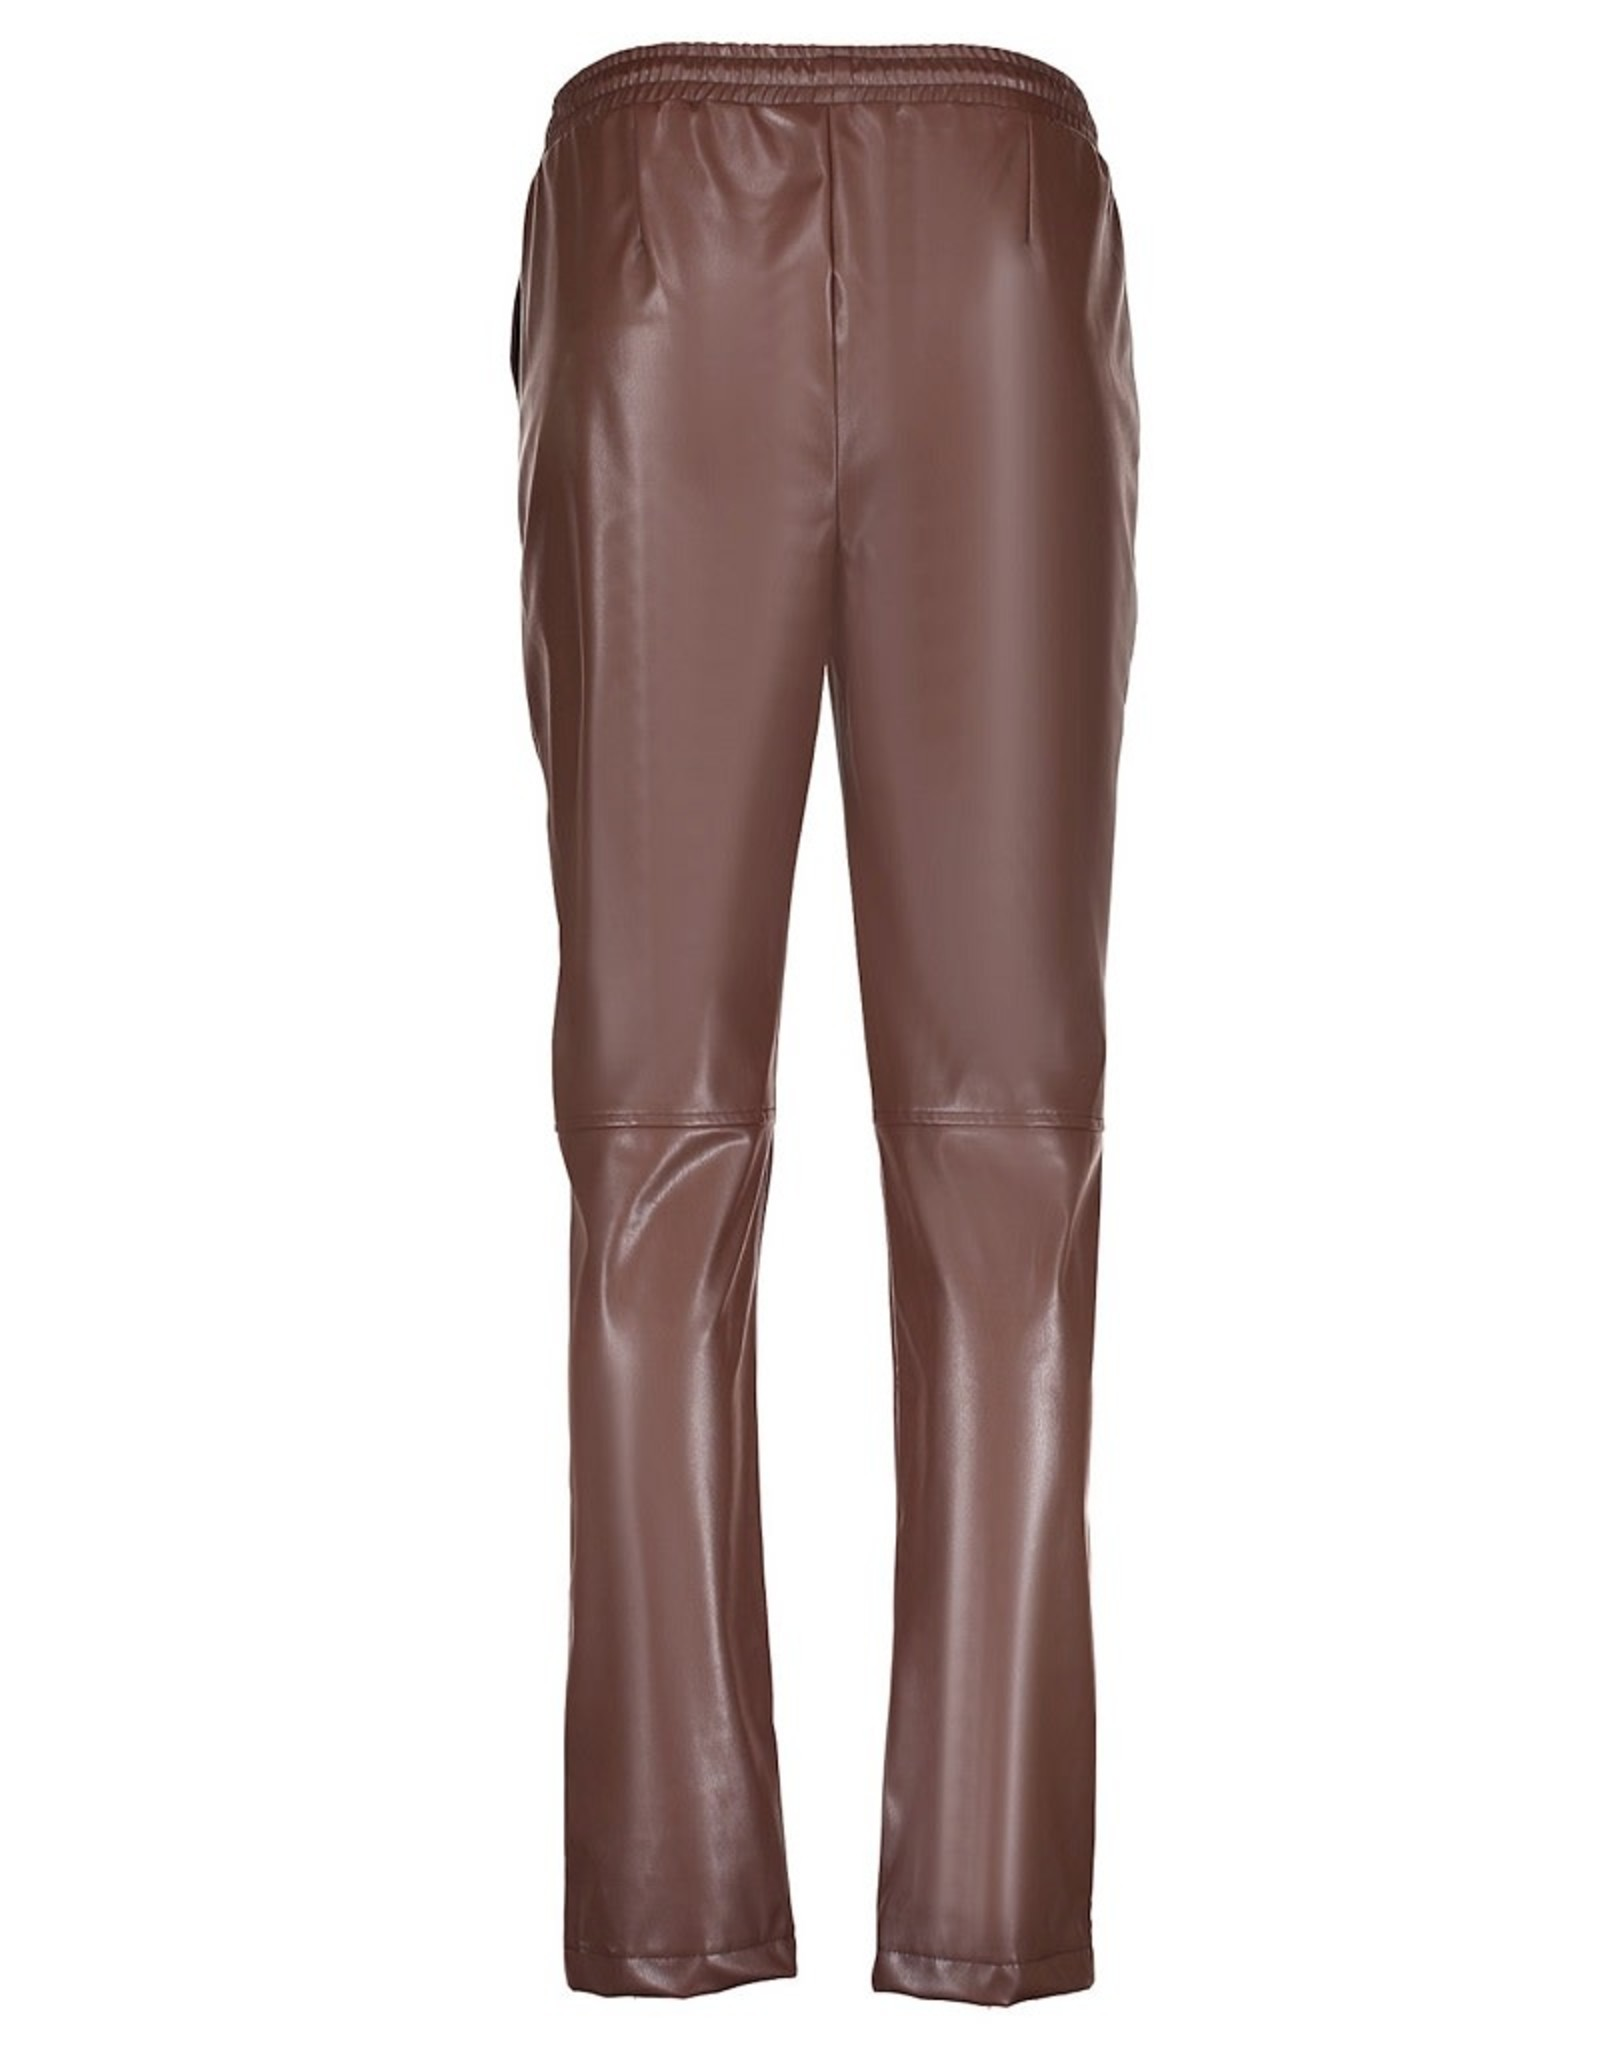 Geisha Geisha pants chino leather look brown